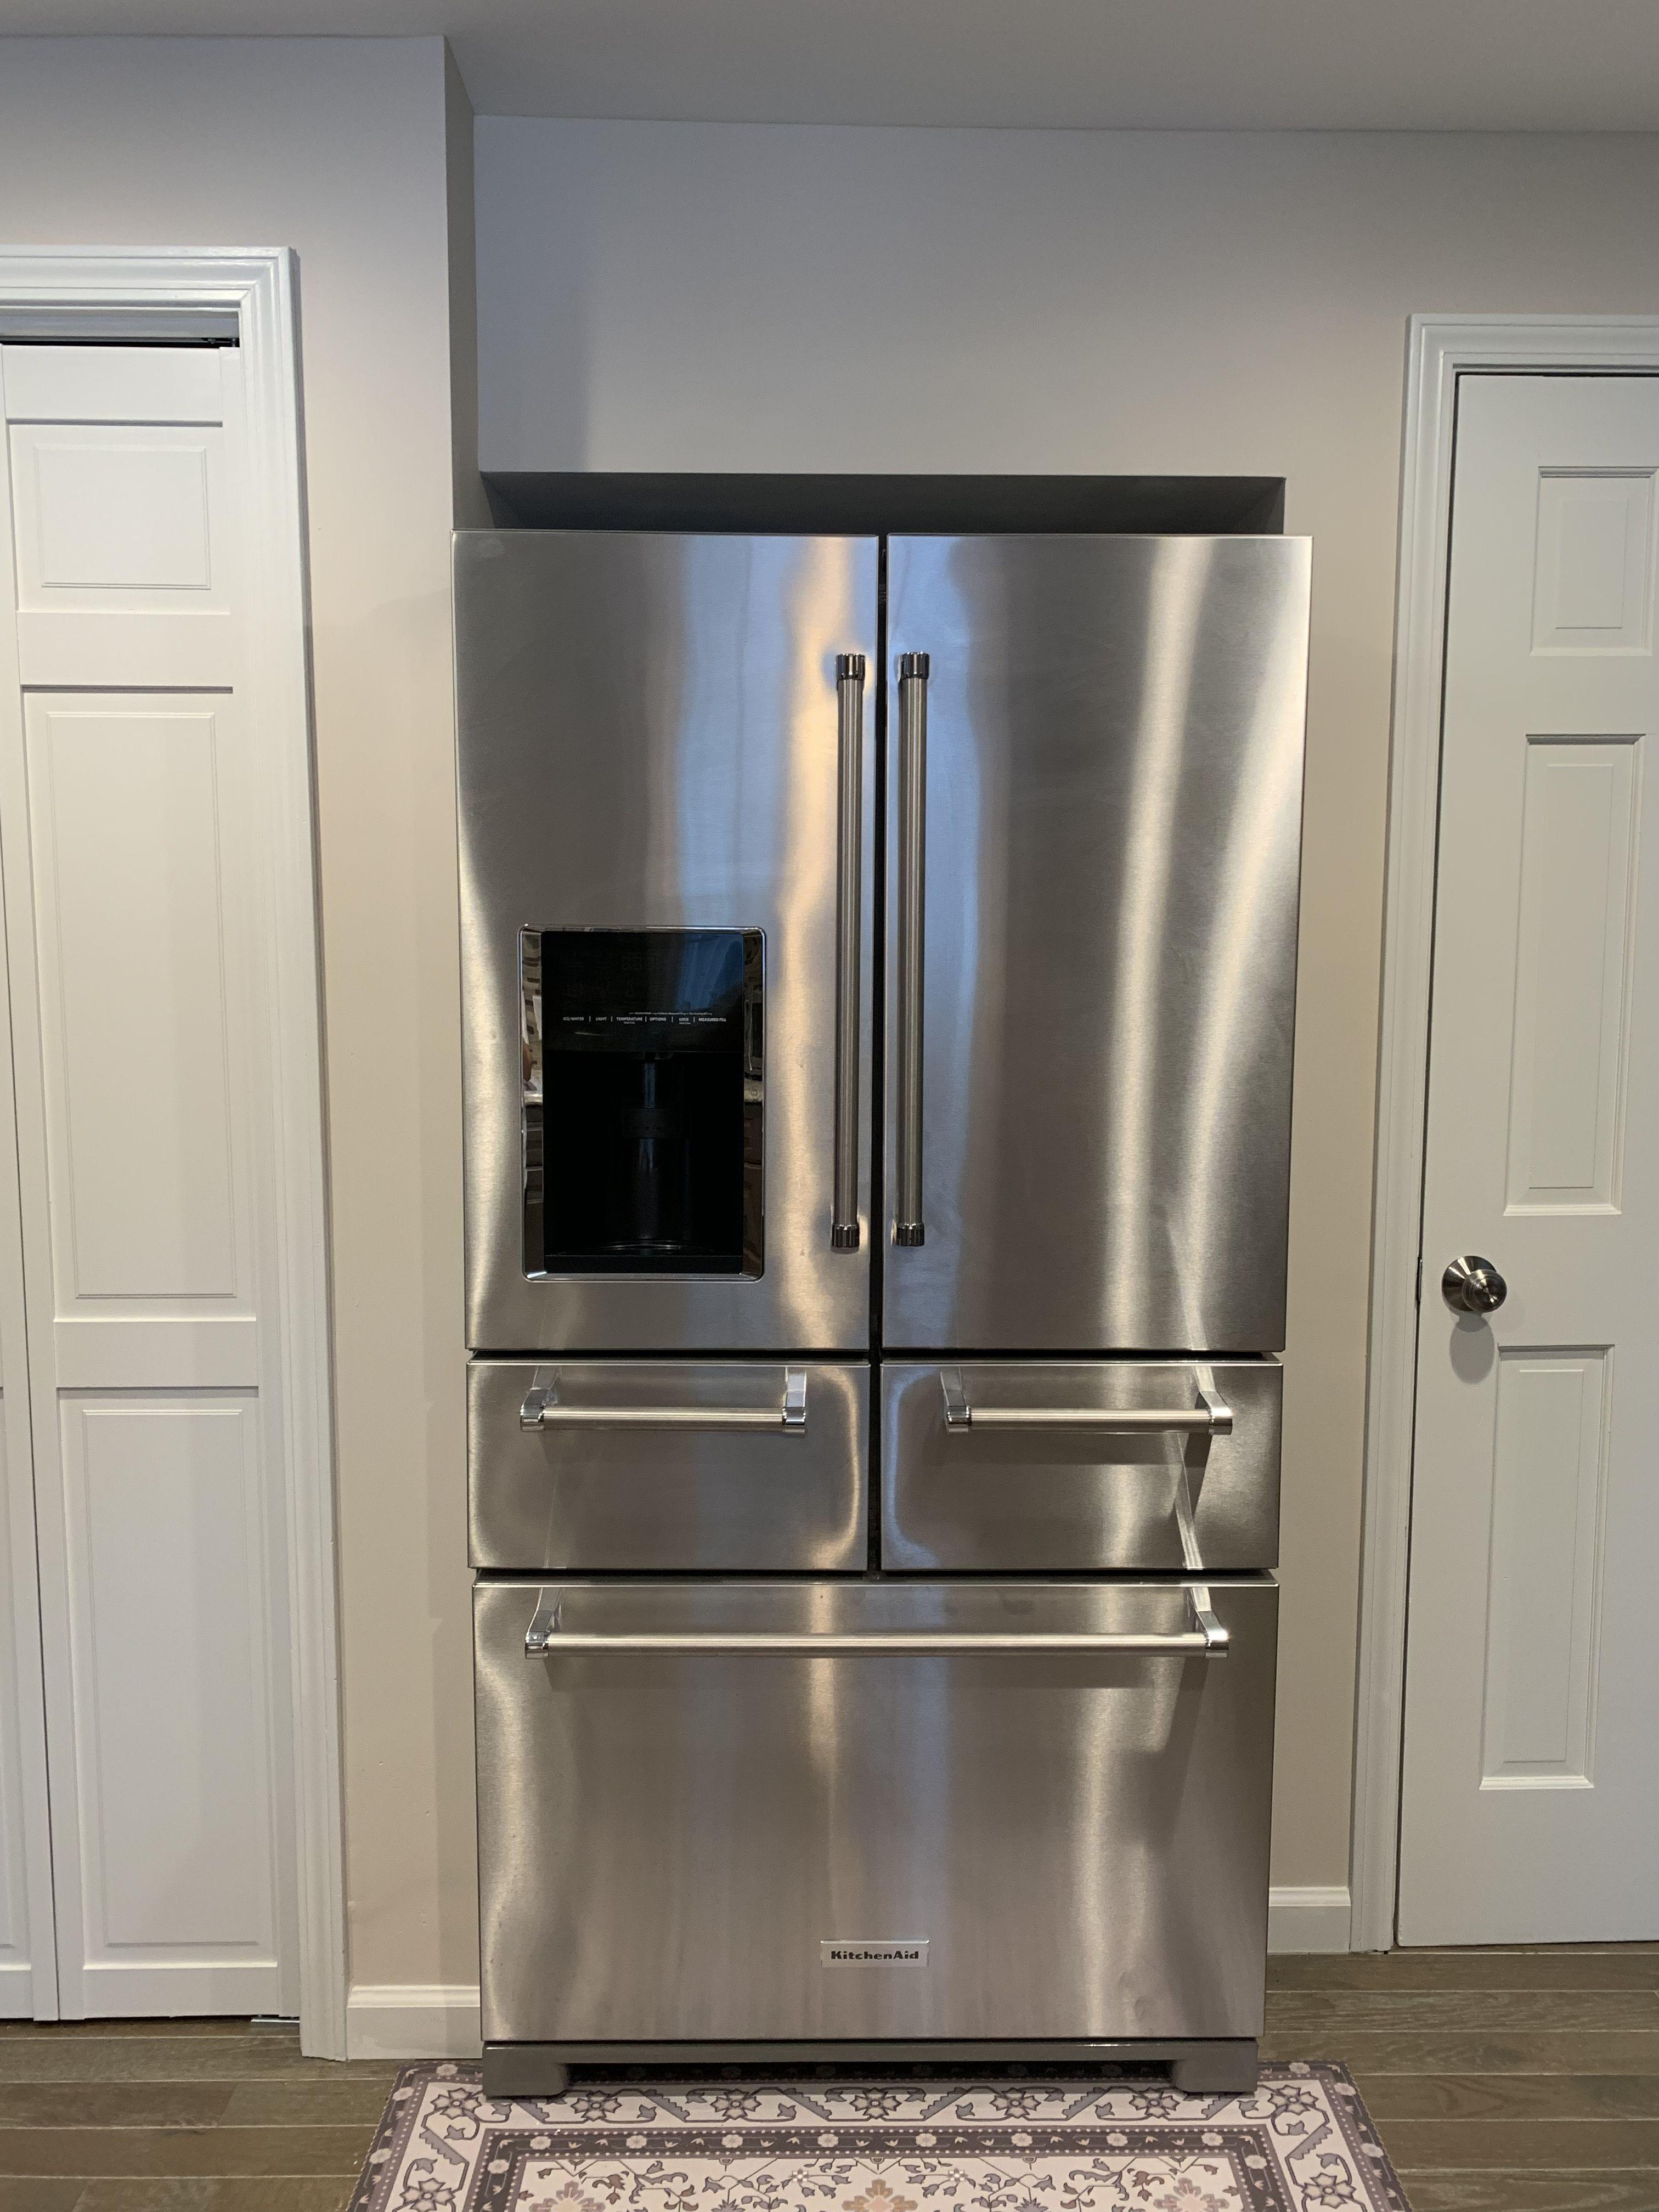 Kitchen aid 5 door refrigerator home depot casas